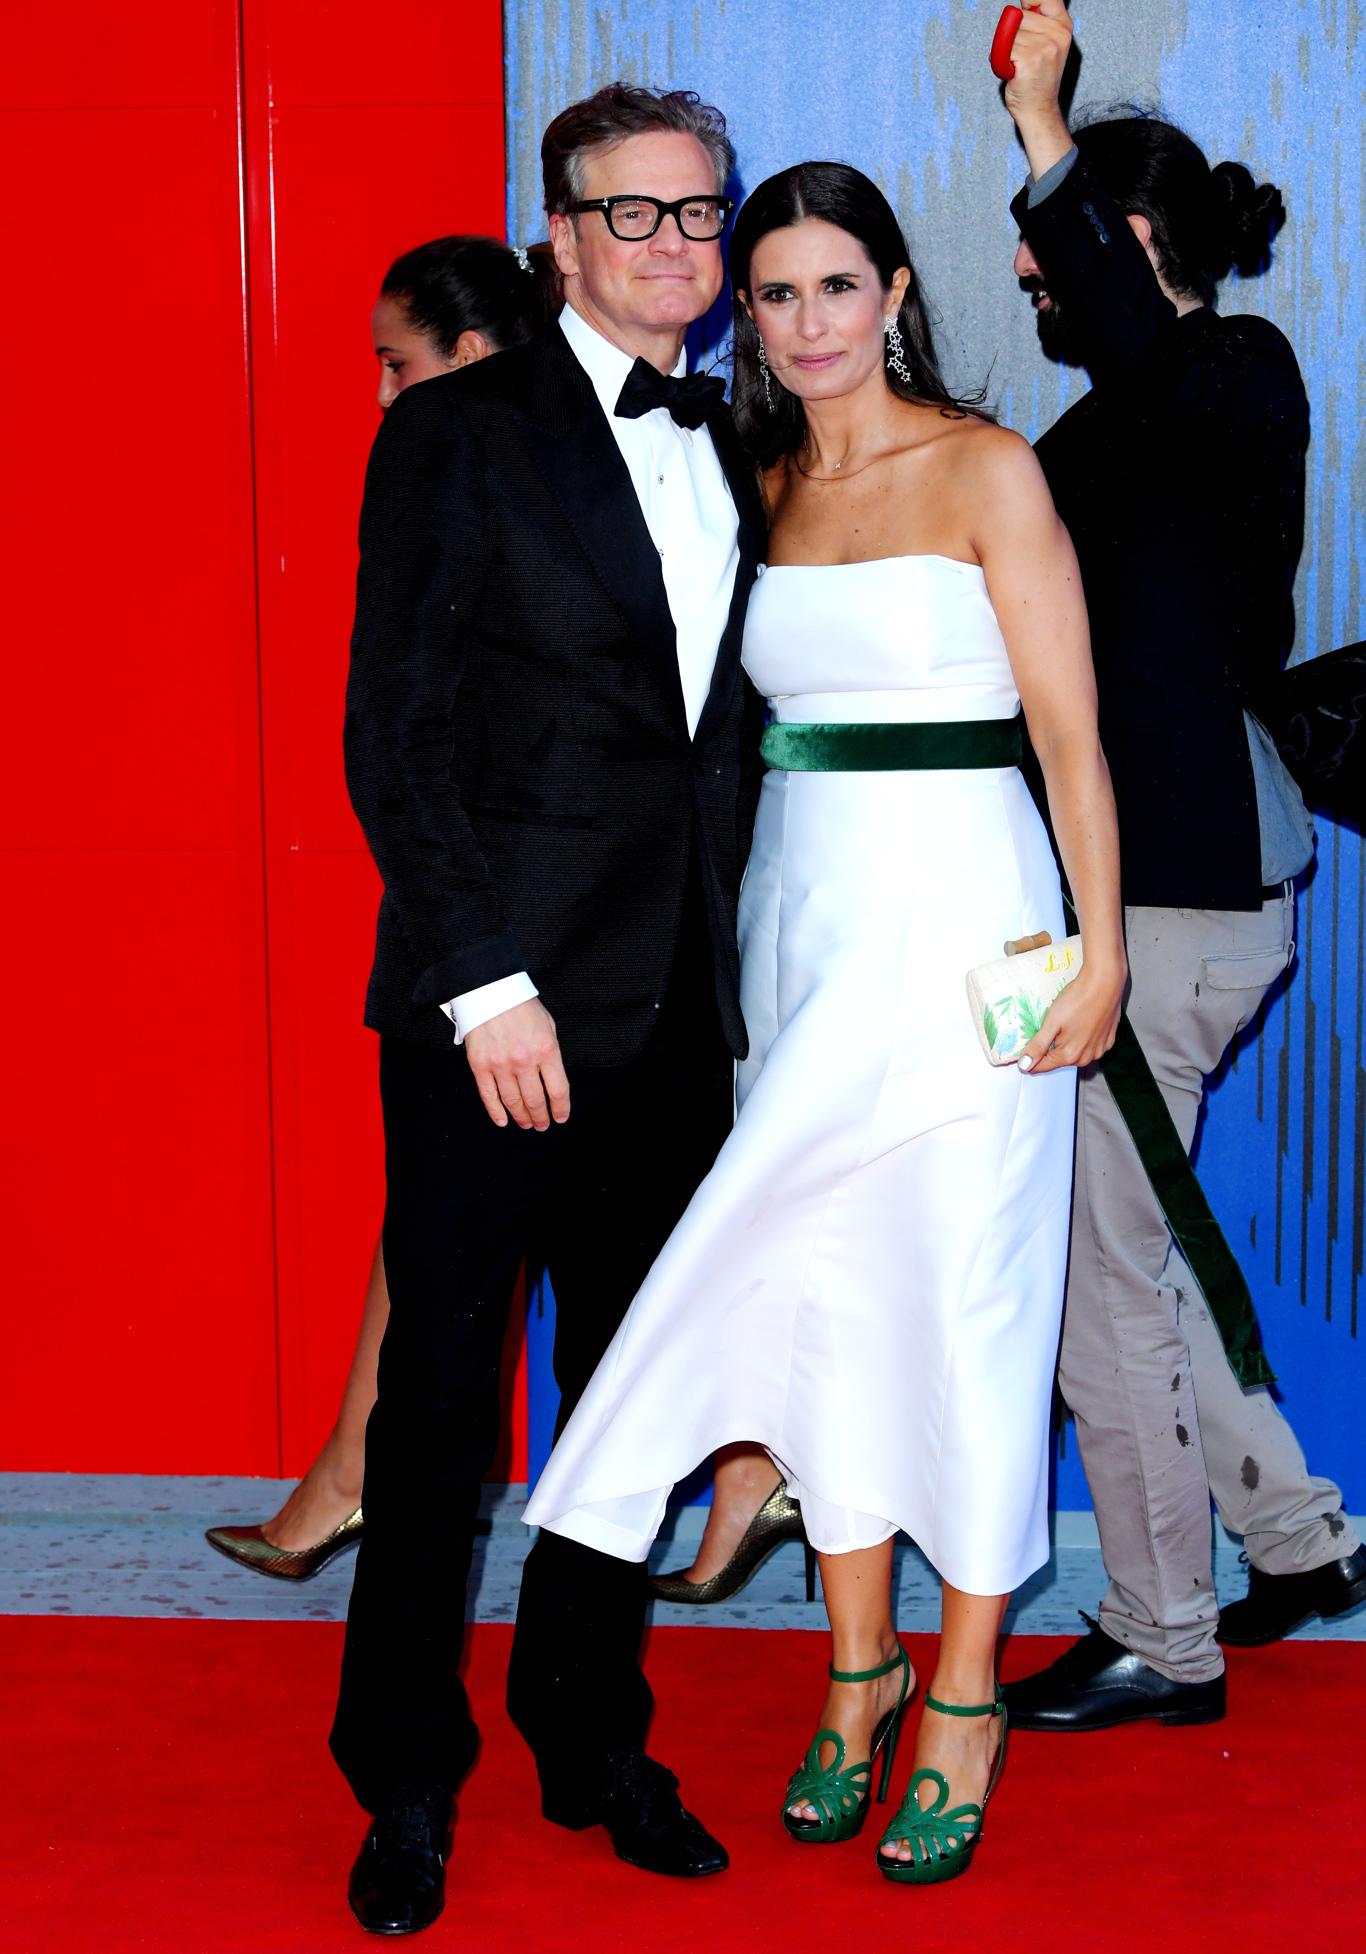 Colin Firth and his wife LiviaThe Franca Sozzani Award, 74th Venice International Film Festival, Italy - 01 Sep 2017